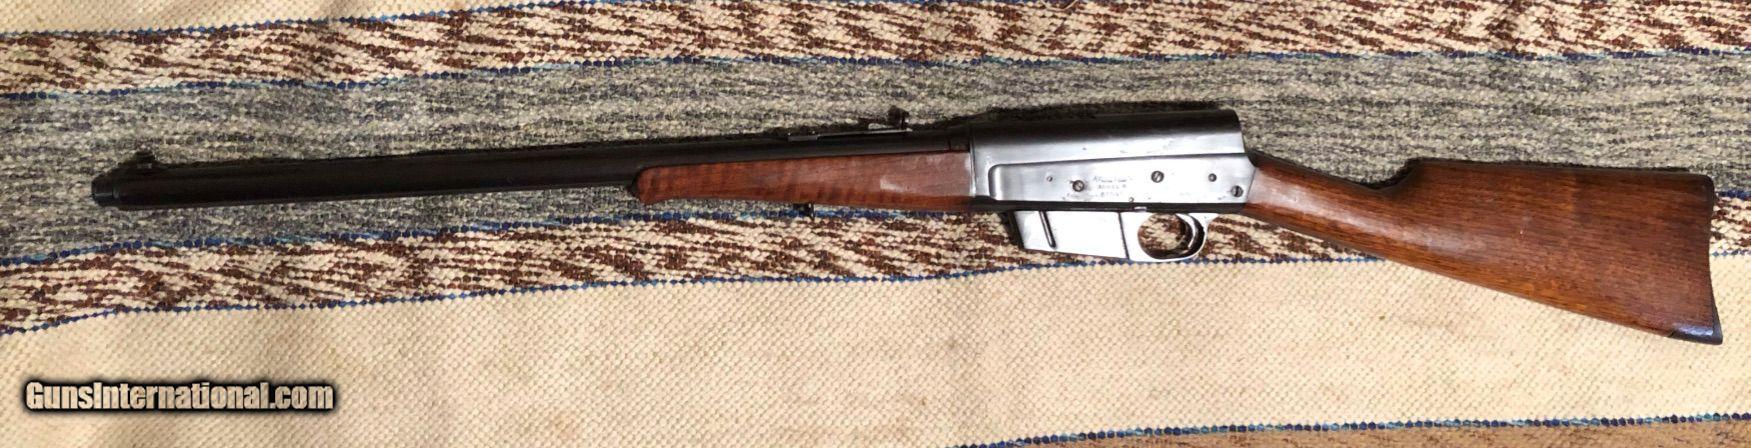 M8 Remington semi automatic rifle 25 caliber 1931 RARE